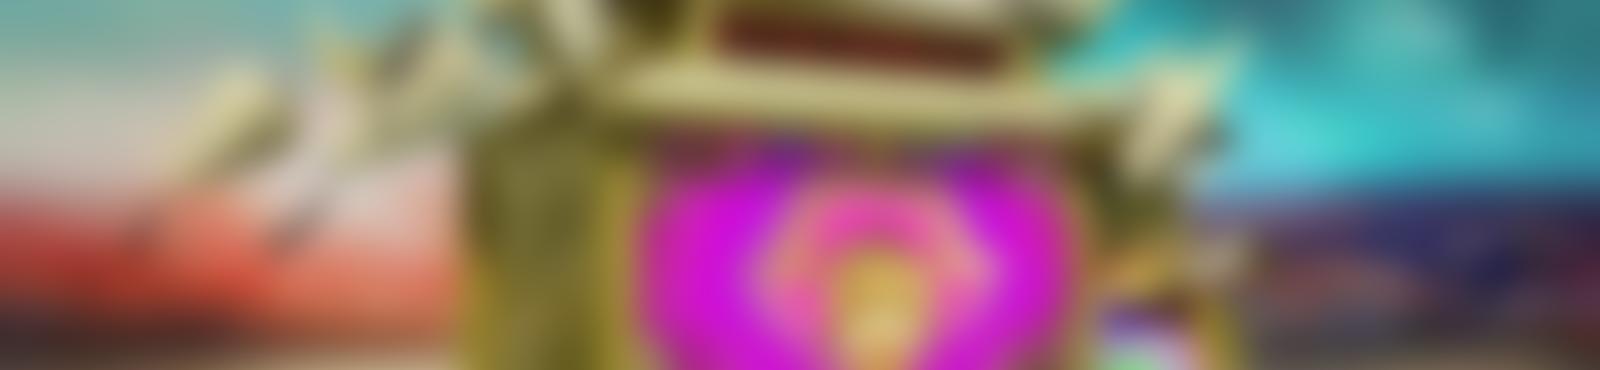 Blurred 97ac4440 37e9 43ba 9ae1 e7f8a5227140